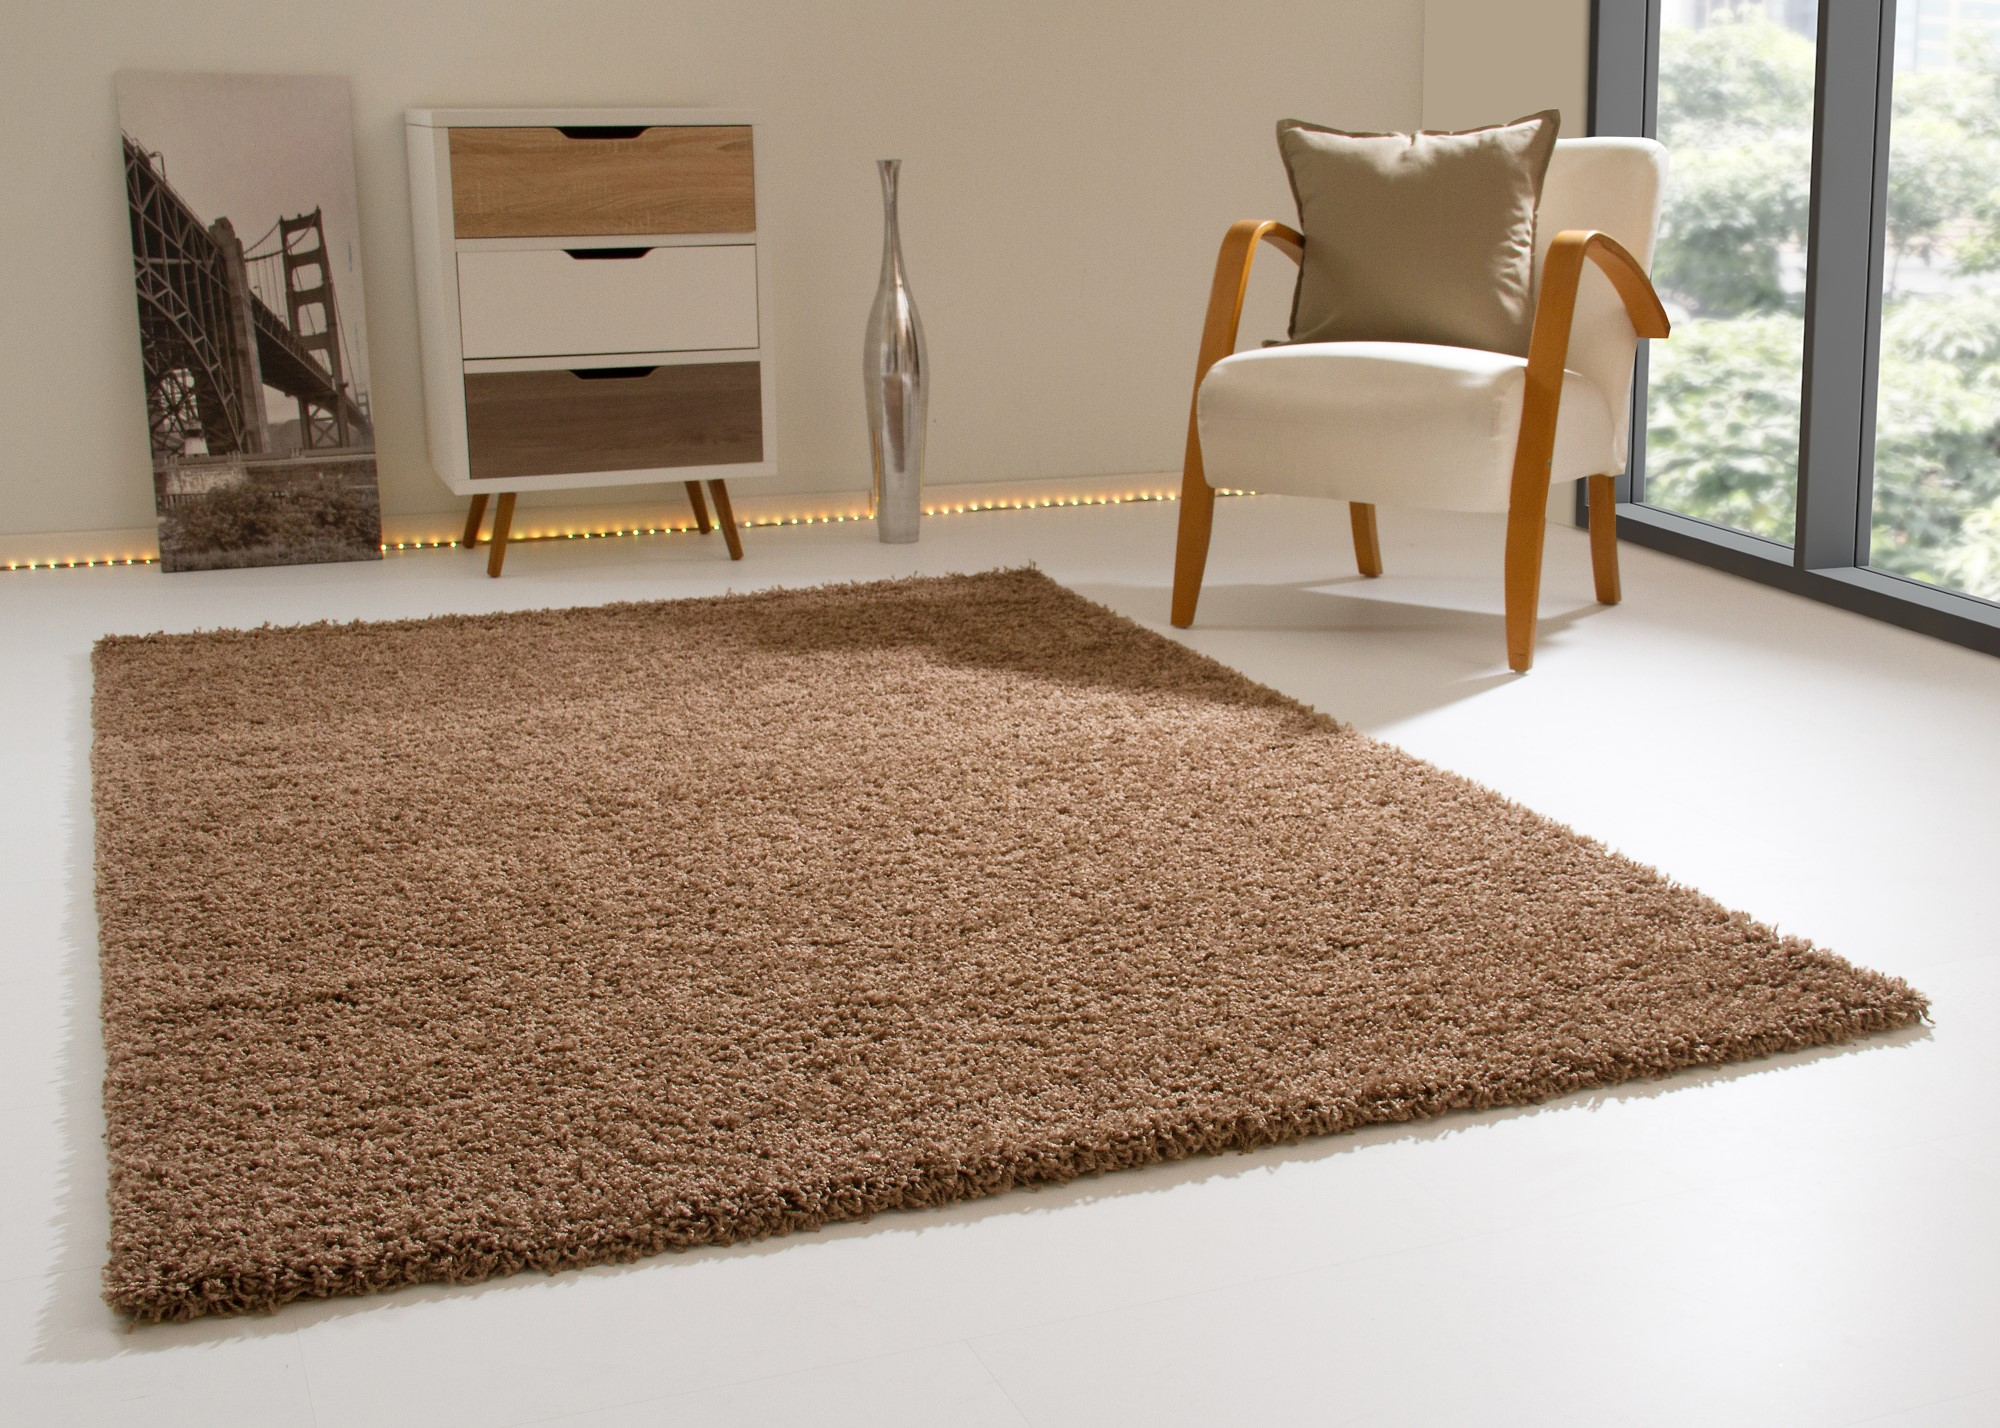 langflor hochflor teppich happy kuschel shaggy uni in vielen gr en neu ebay. Black Bedroom Furniture Sets. Home Design Ideas